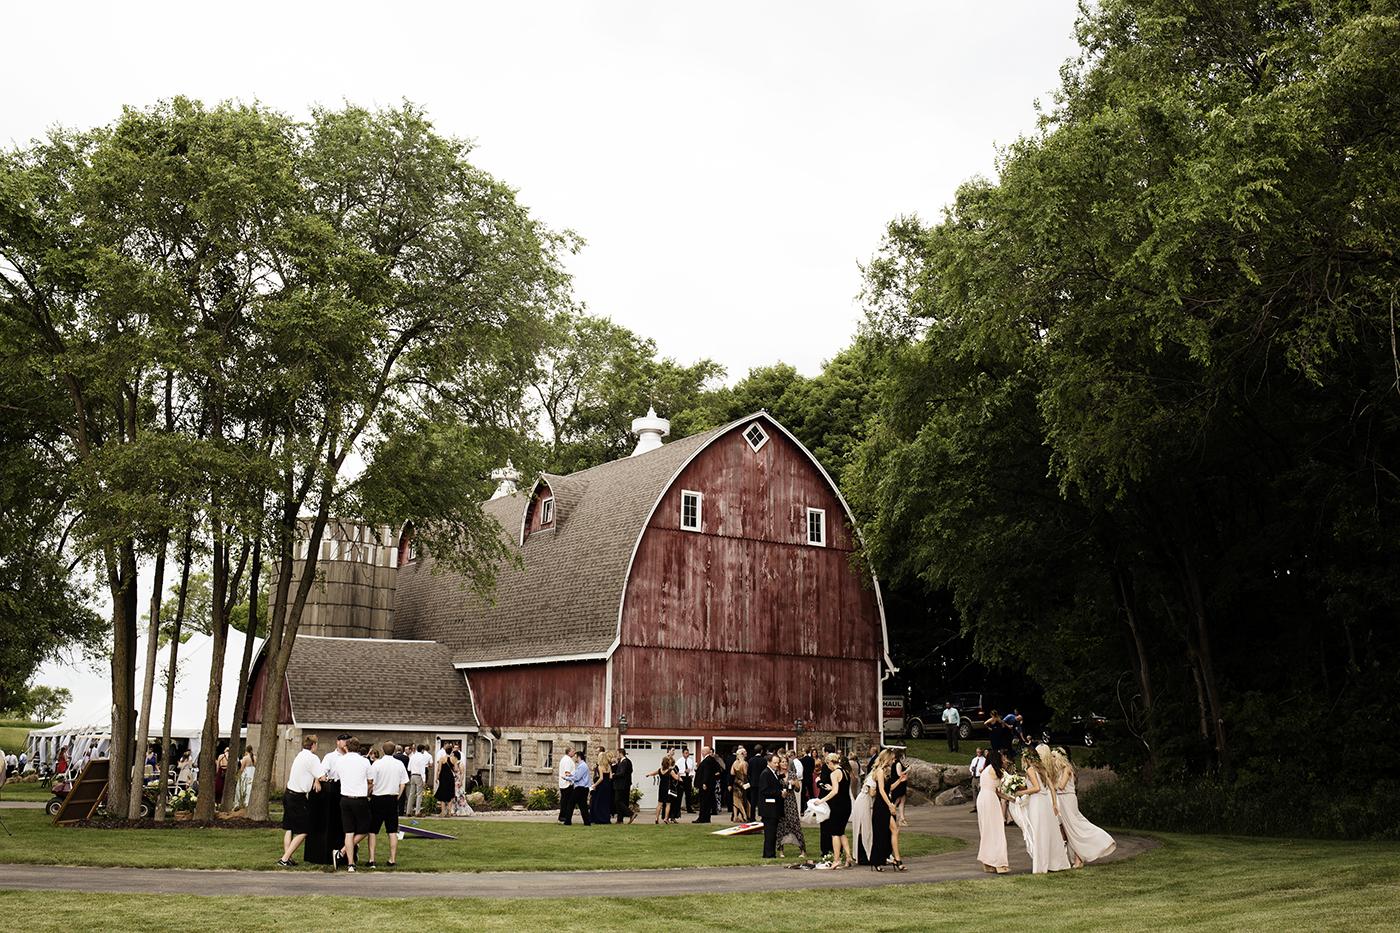 Buffalo MN Barn Wedding | Wedding Photographer | Photos by Photogen Inc. | Eliesa Johnson | Based in Minneapolis, Minnesota